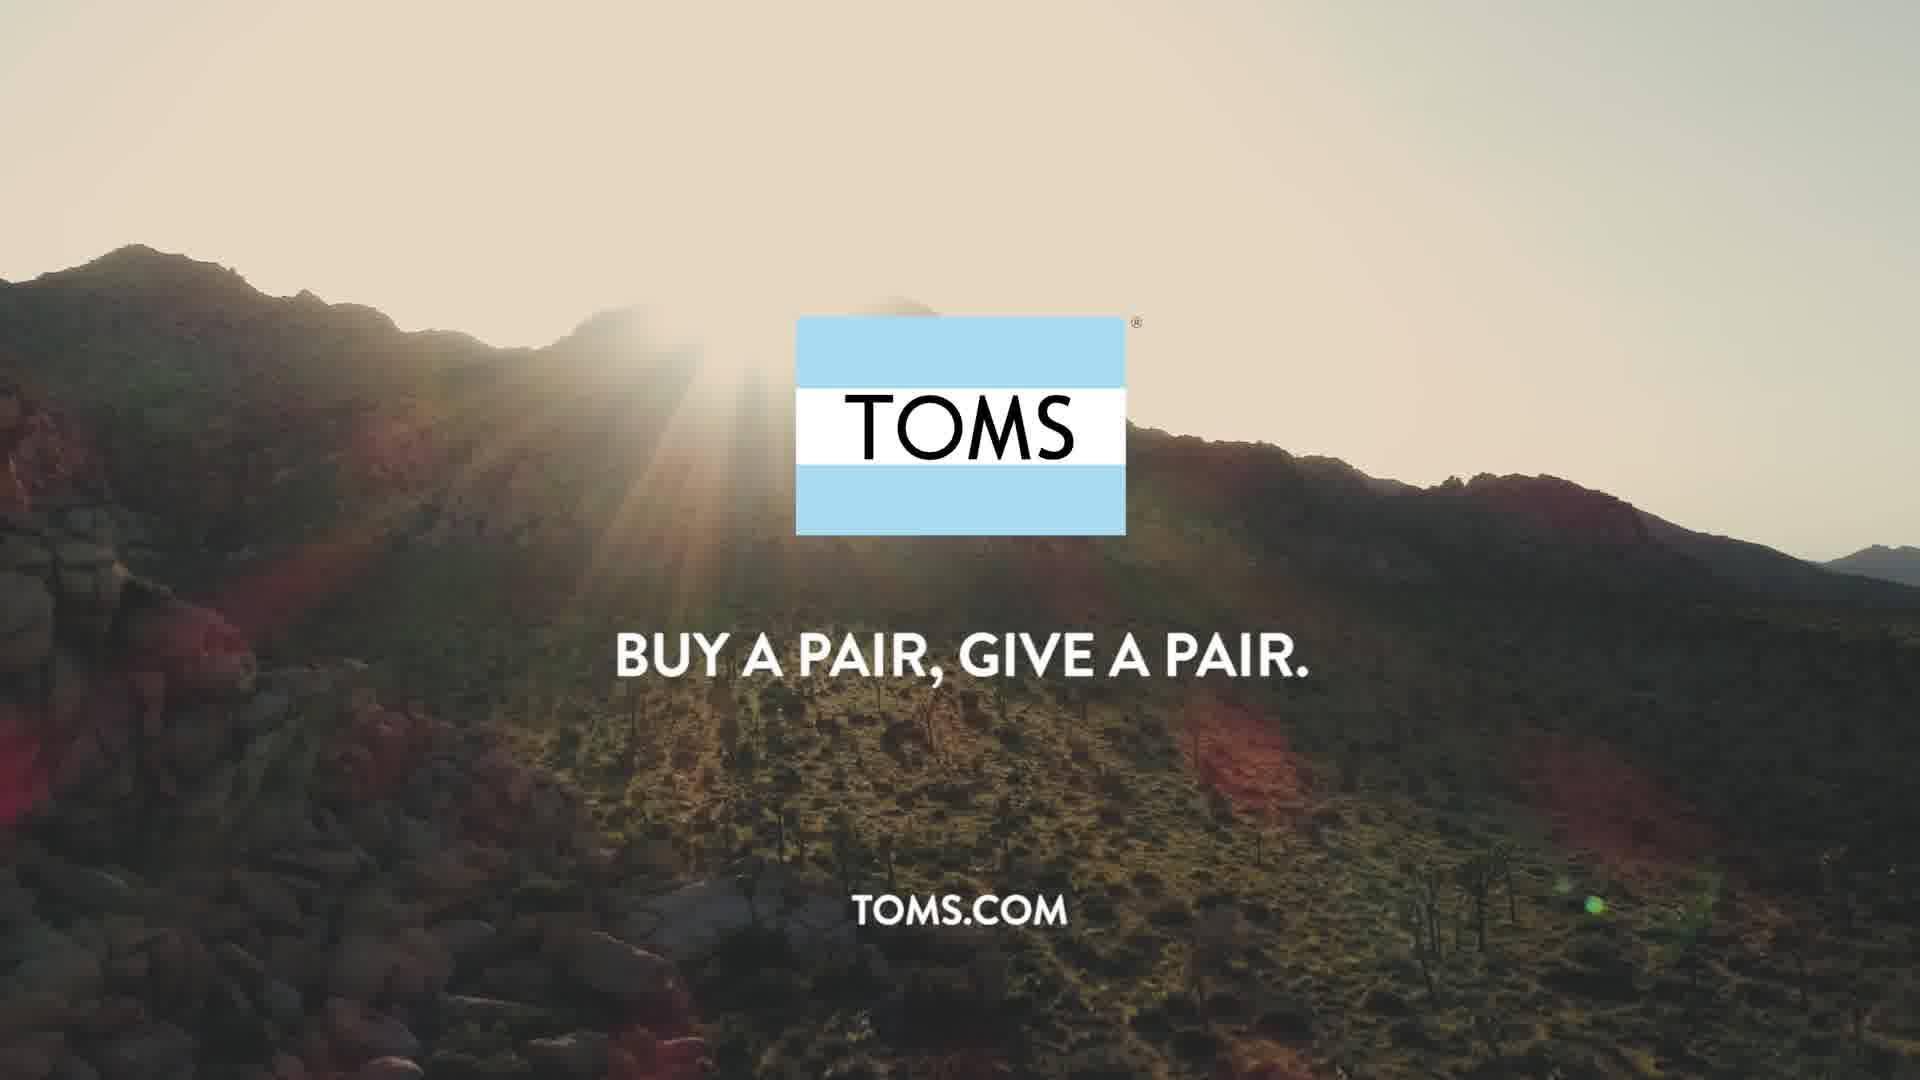 TOMs Mit-Treuepunkten-die-Welt-retten-Capgemini-Invent